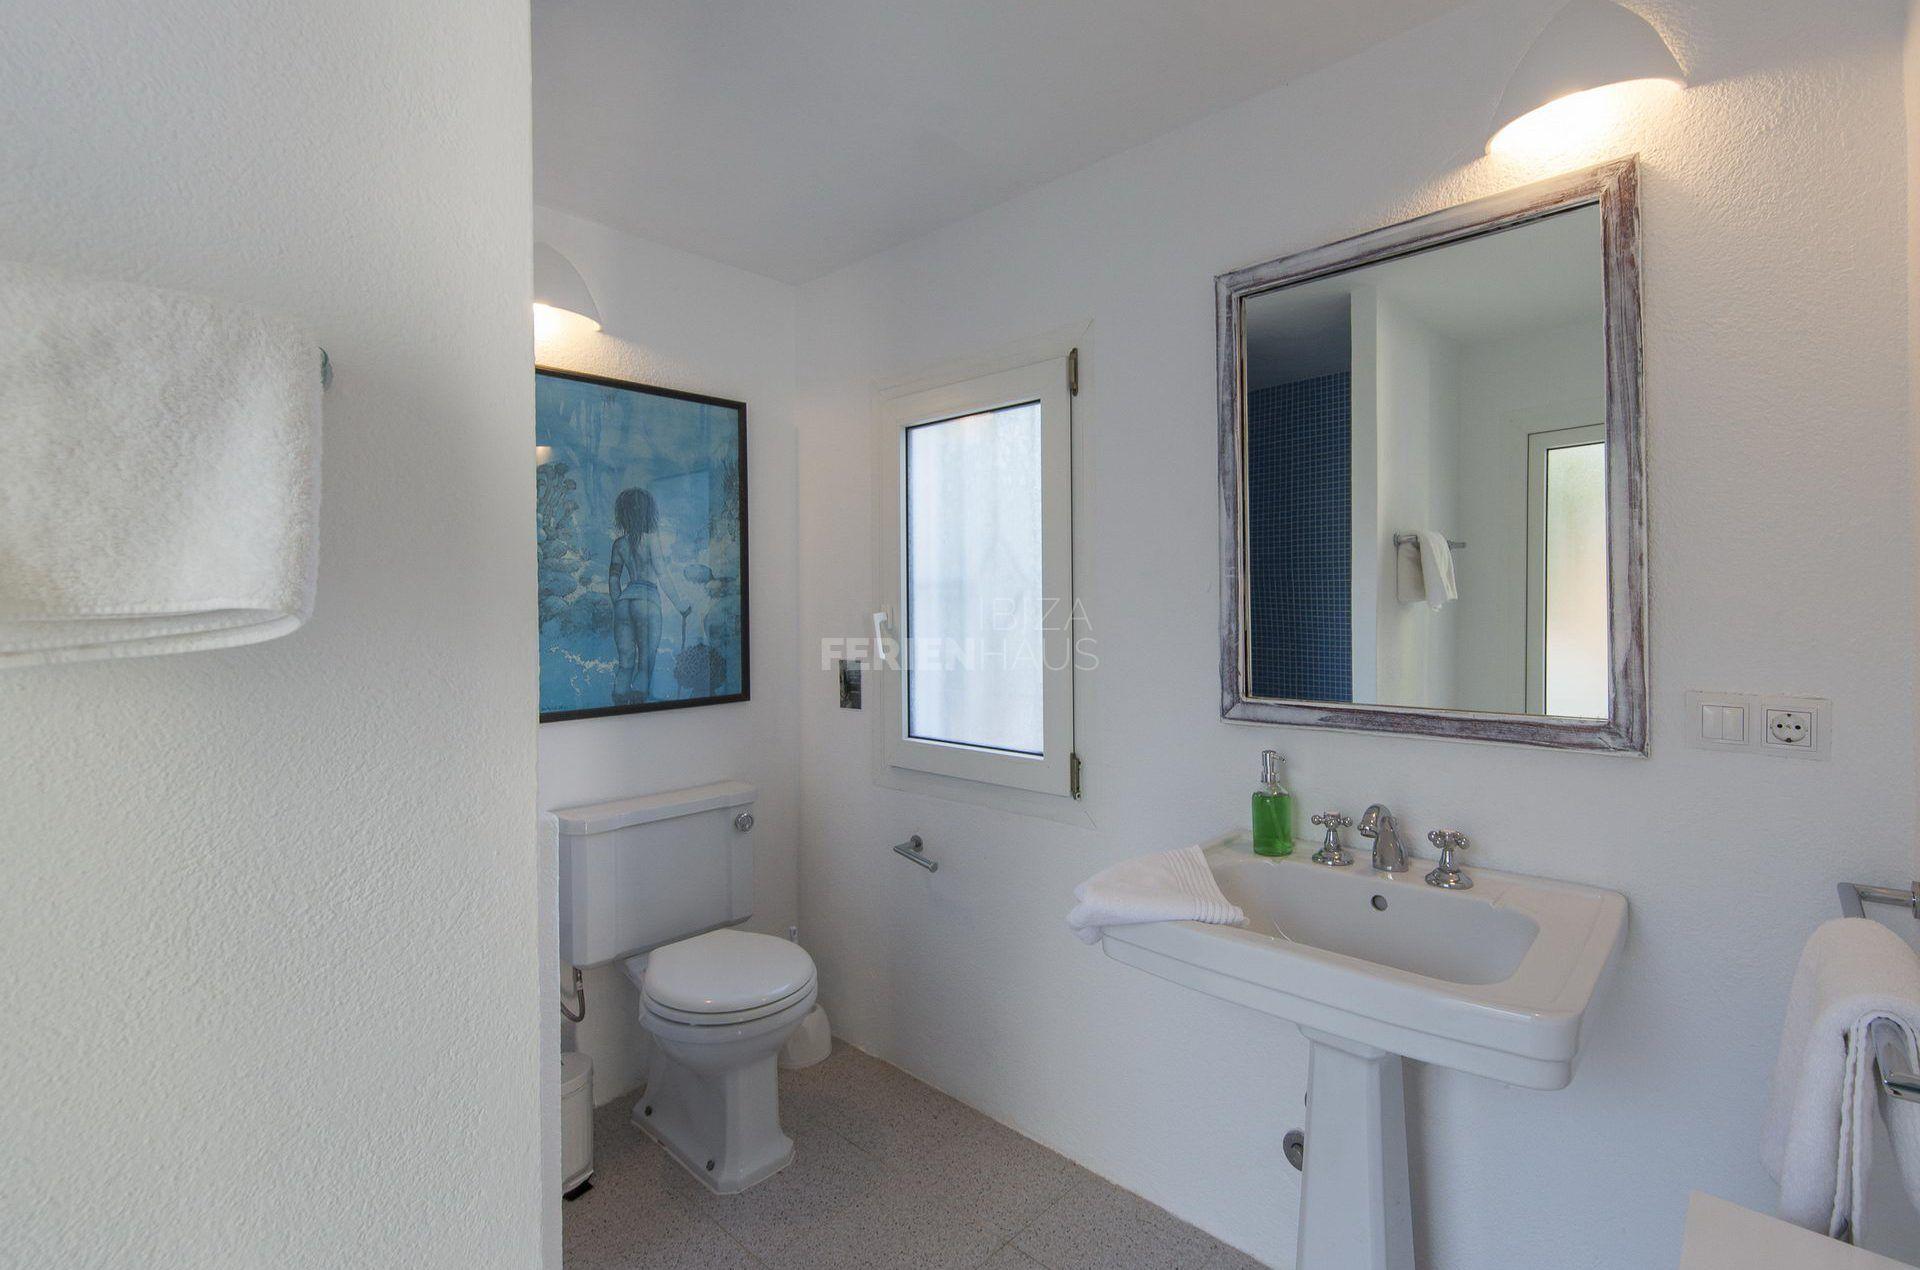 Annex Room Bedroom 8 bath